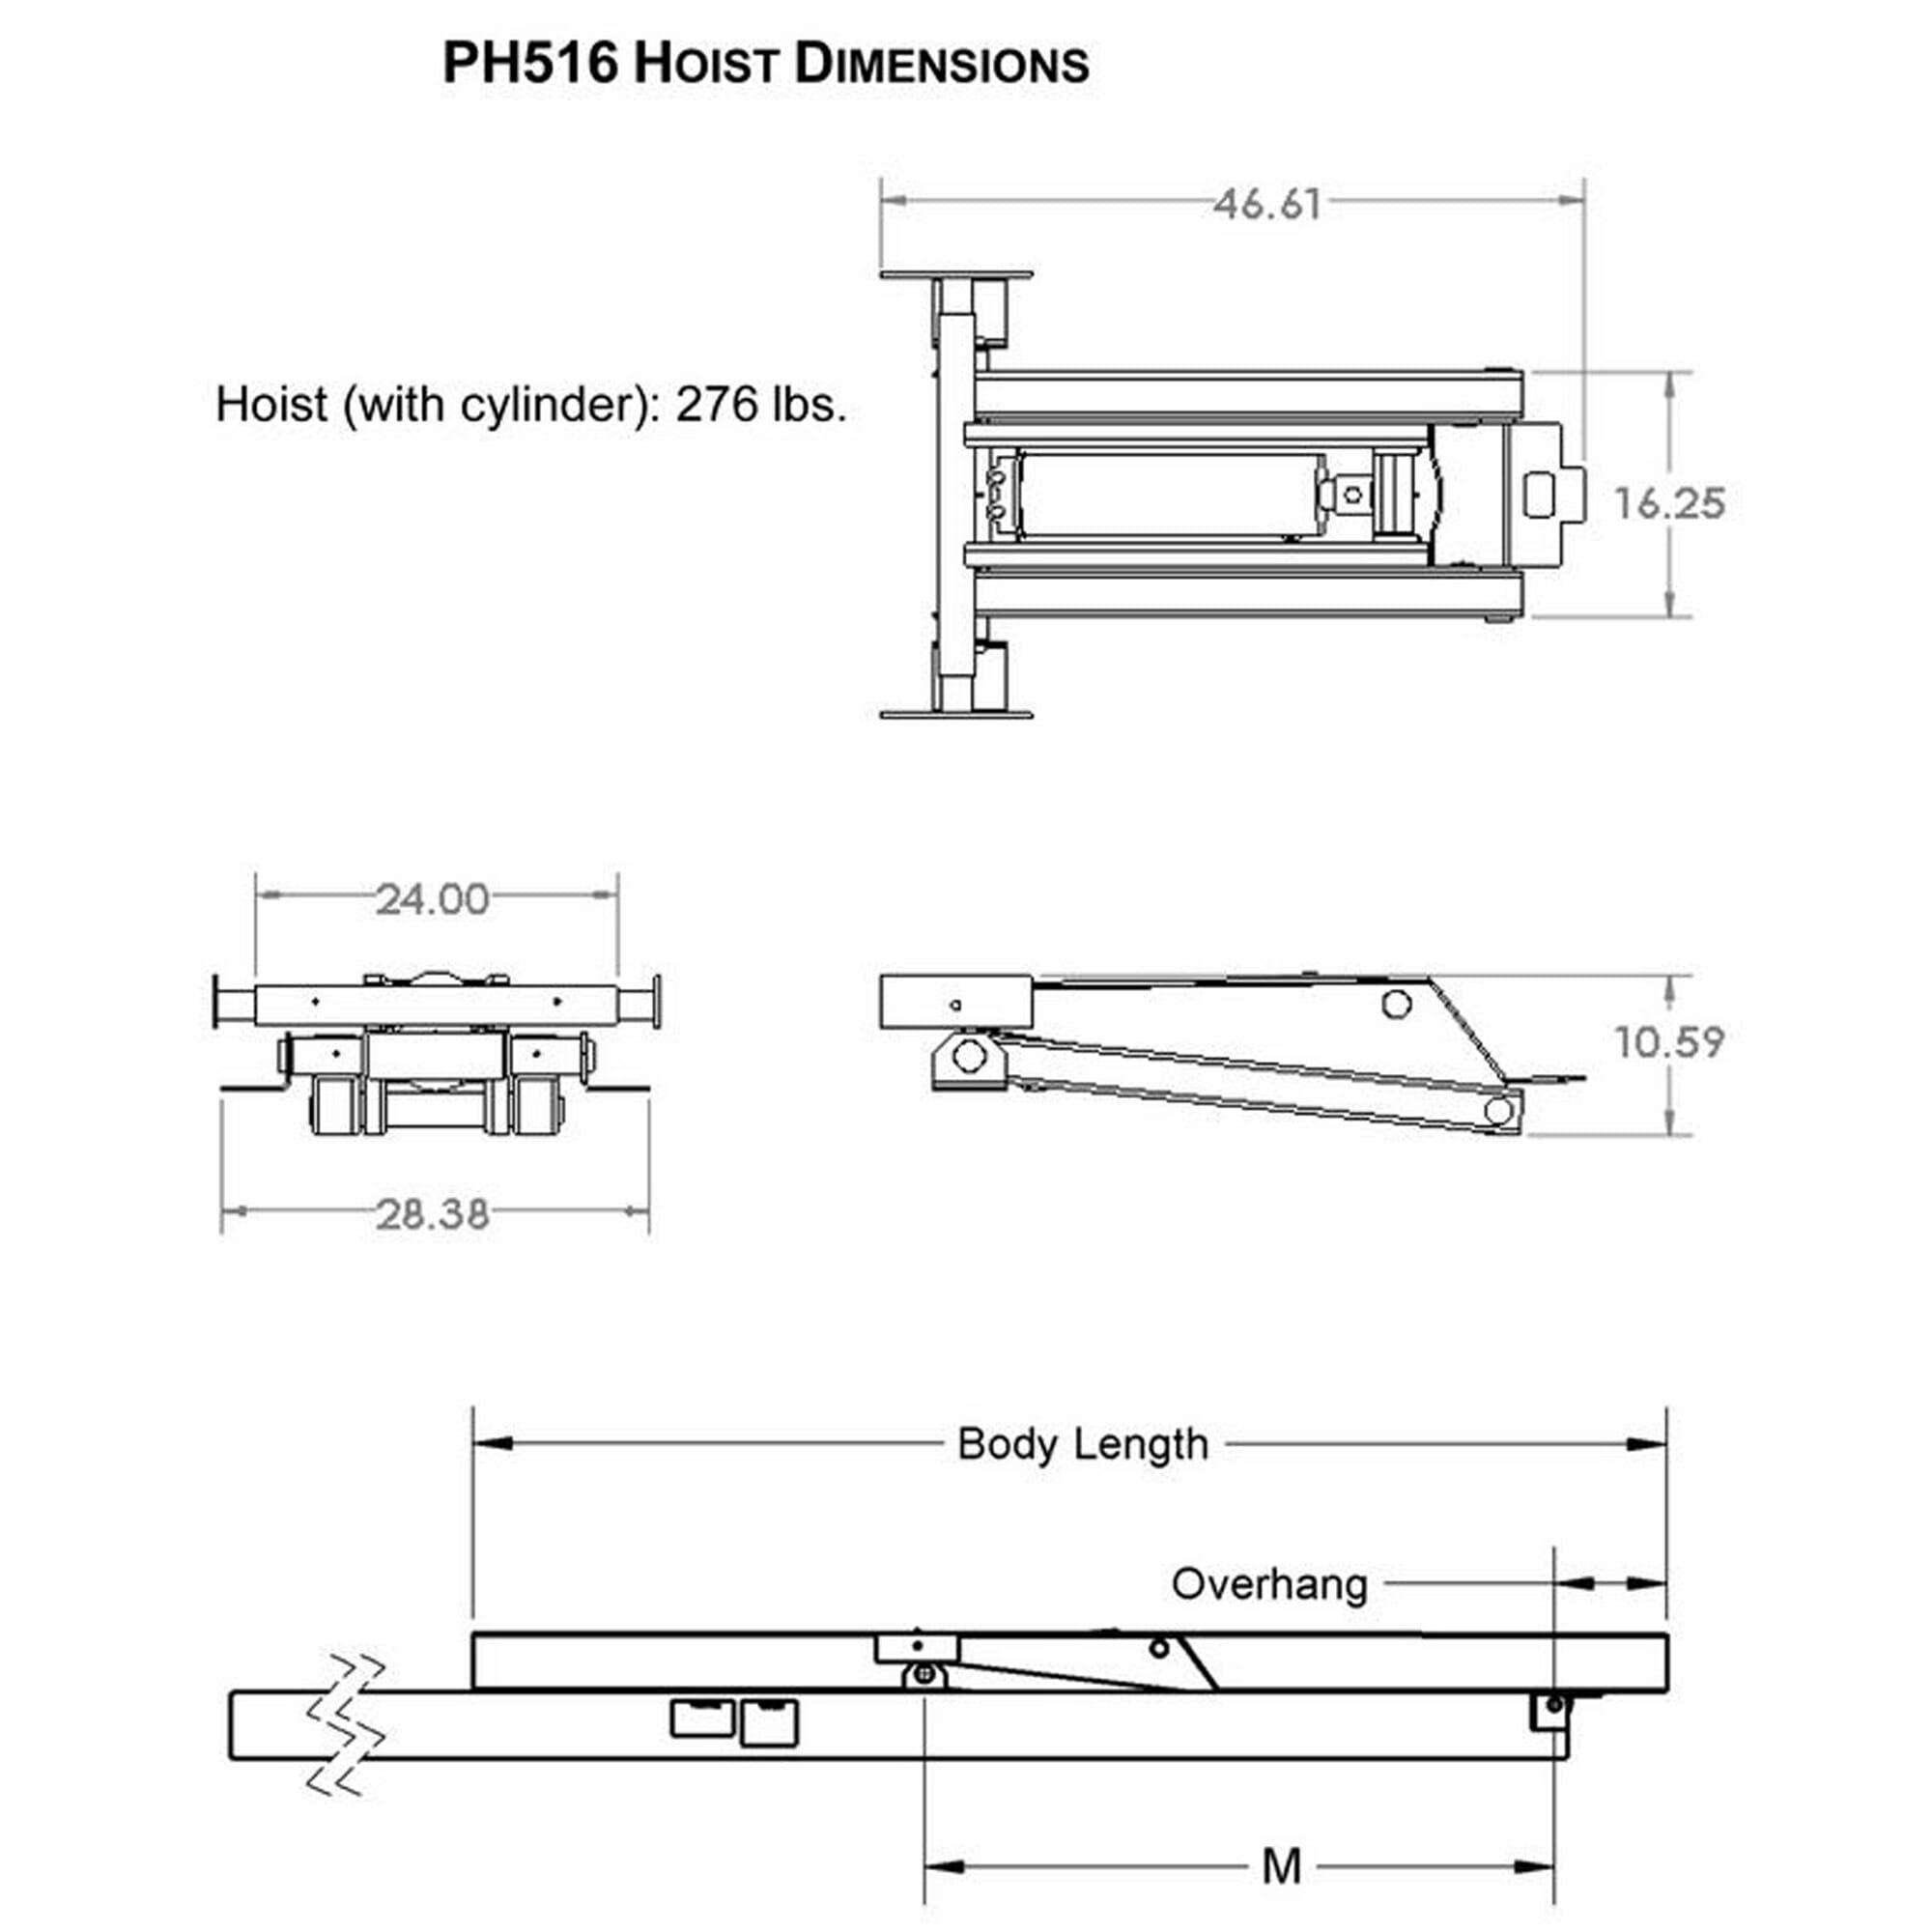 2cv Pk2 Gam in addition 5287080823 also Showthread further 8 Ton 16000 Lb Dump Trailer Hydraulic Scissor Hoist Kit Ph516 as well How To Build Your Own Teardrop Trailer. on car dolly blueprints